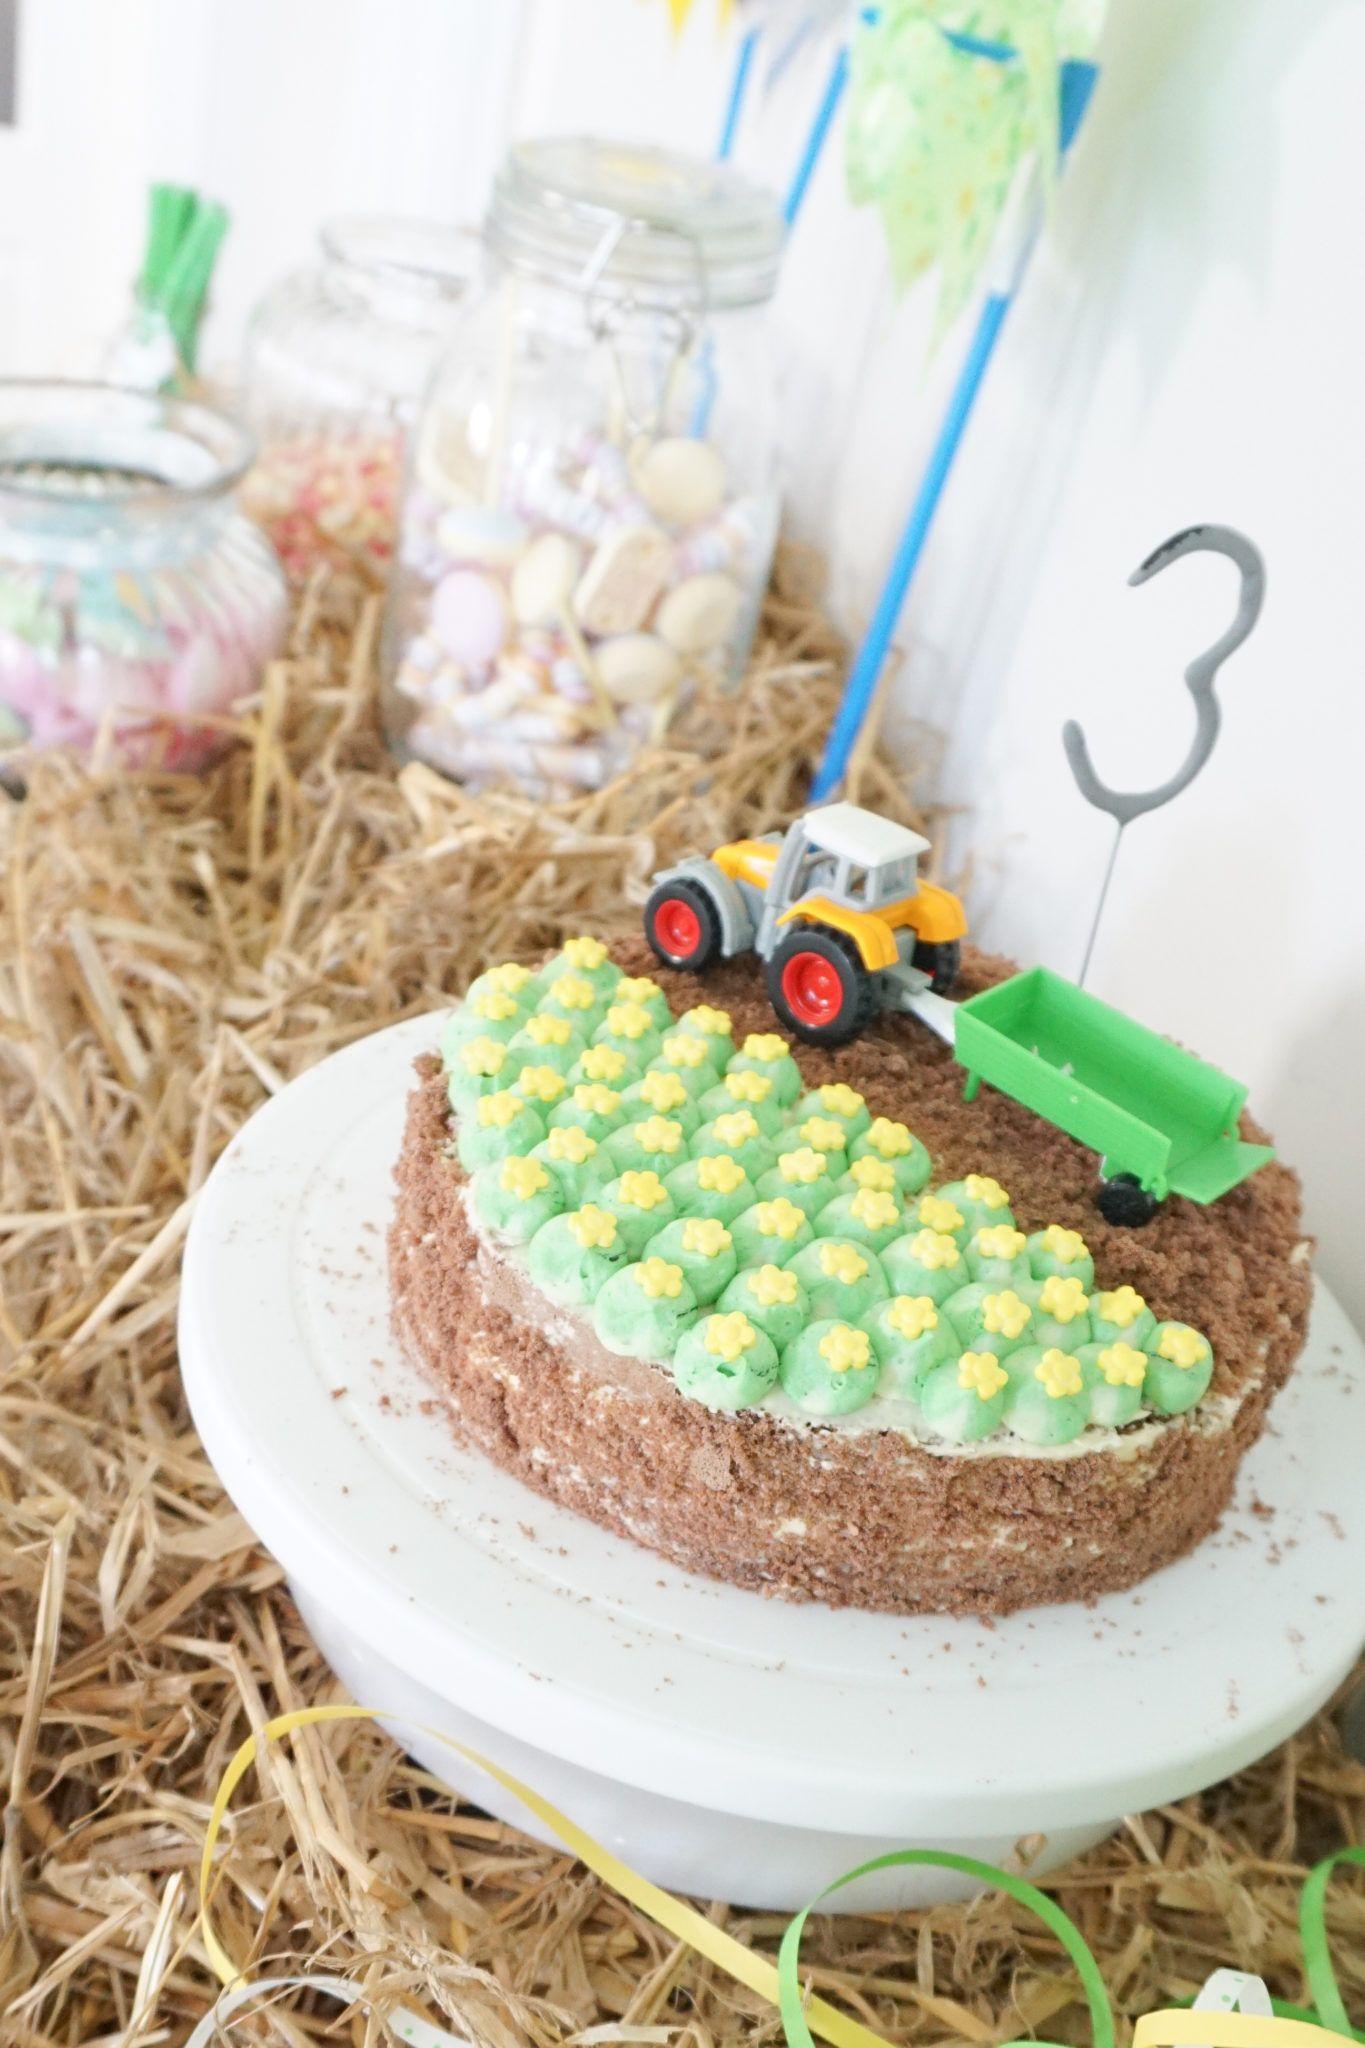 Traktor Geburtstag Einladung Torte Deko Deko Hus Traktor Geburtstag Kinder Geburtstag Torte Kuchen Kindergeburtstag Traktor